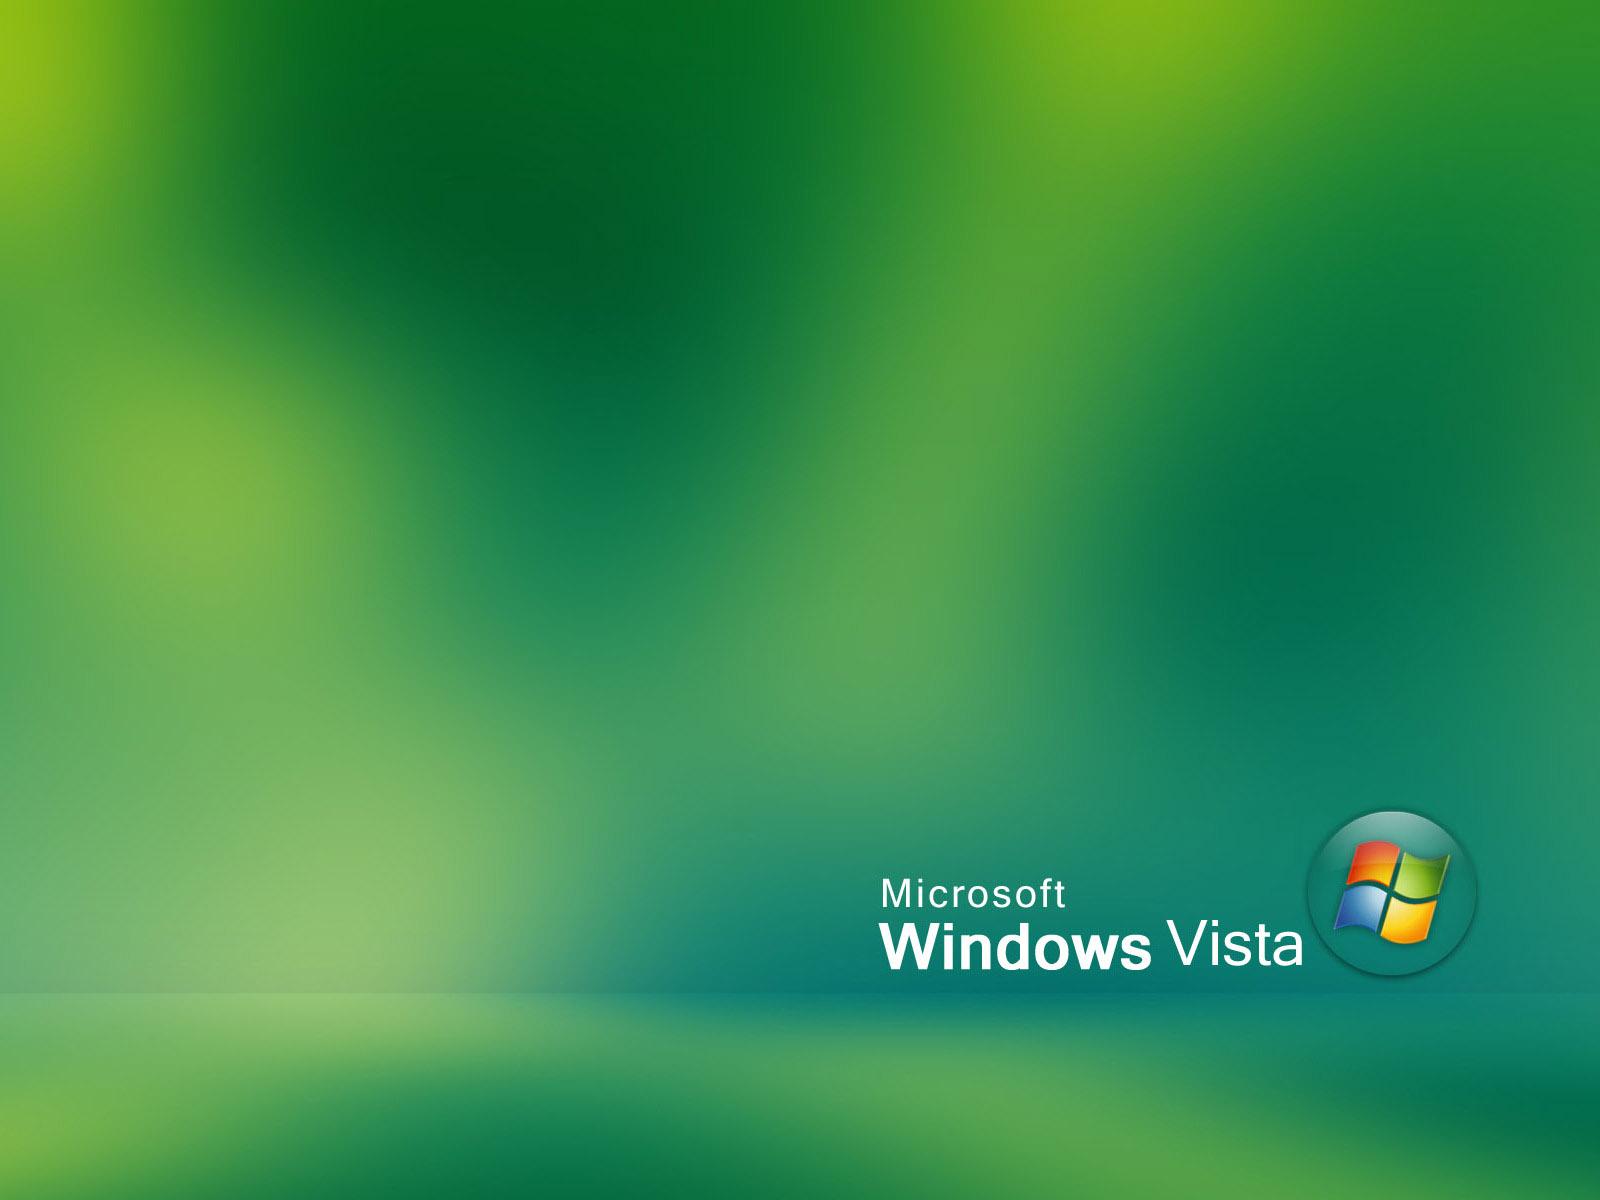 Hd wallpapers windows vista backgrounds - Windows wallpaper themes free ...